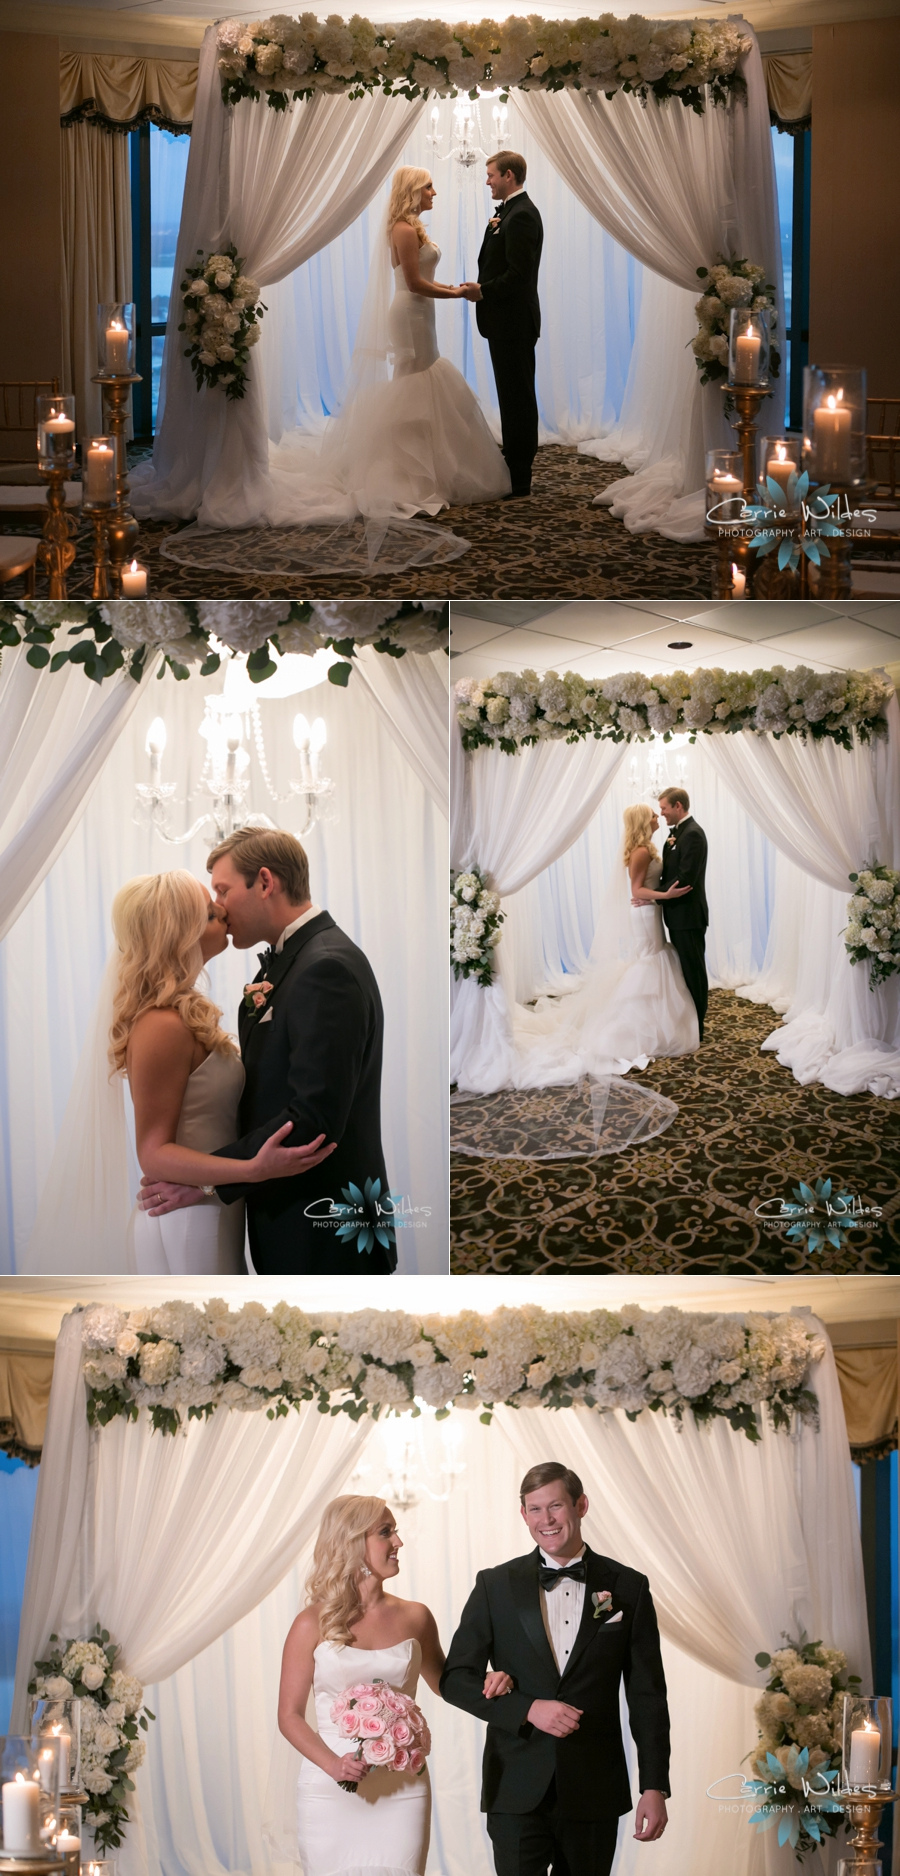 8_29_16 Tampa Club Wedding Styled Shoot_0022.jpg